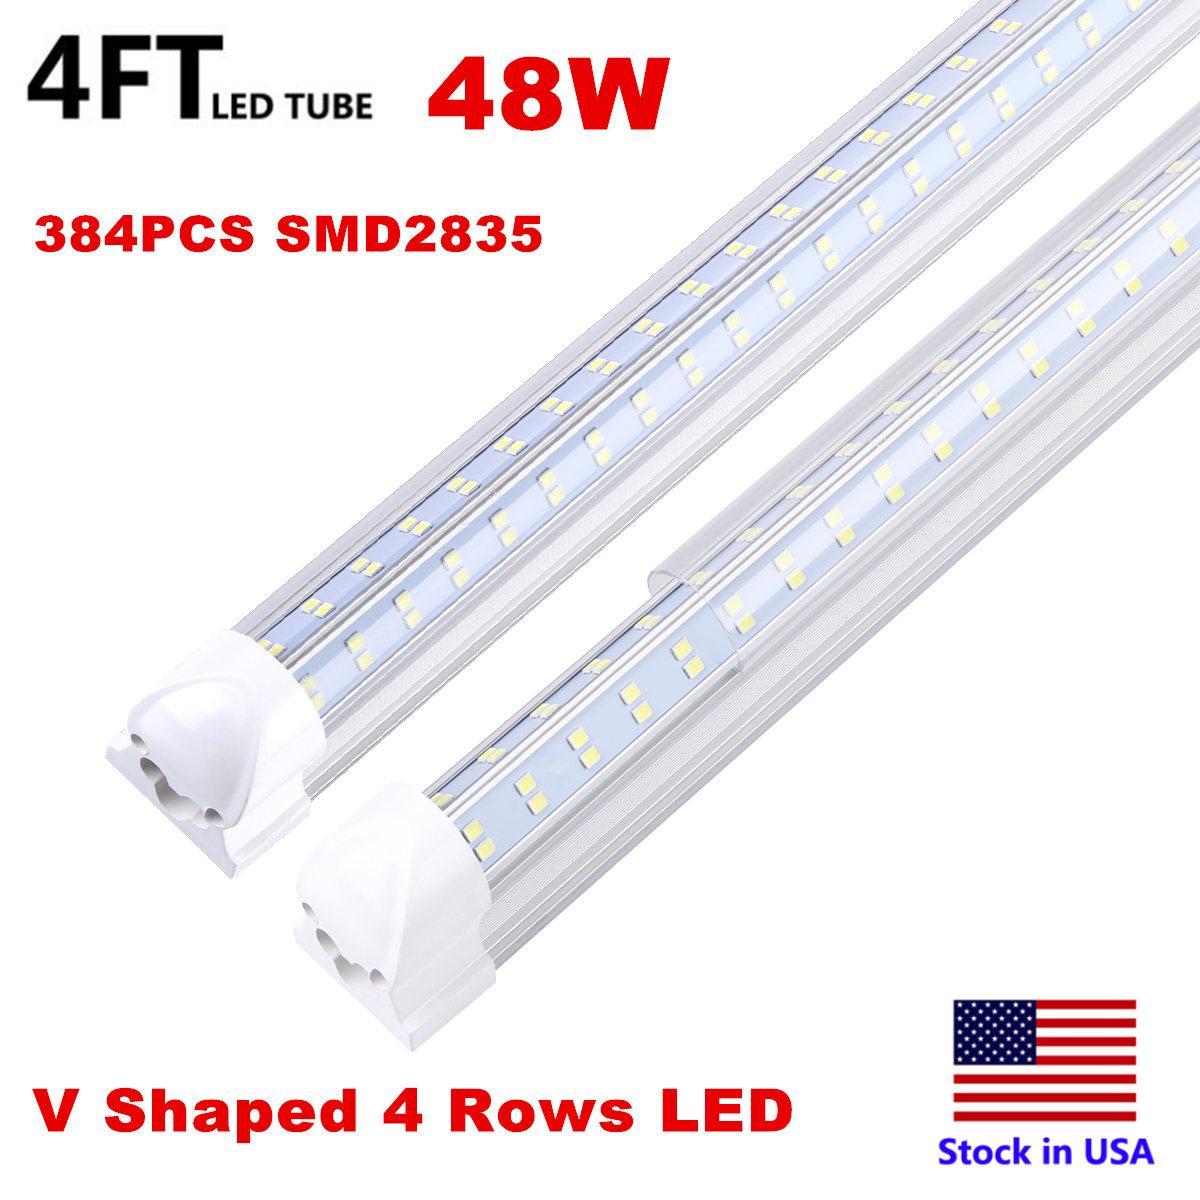 4ft 8ft LED Lights V-Shaped Integrated LED Tube Light Fixtures 120W 4 Row LEDs SMD2835 LED Lights 100LM/W Stock in USA